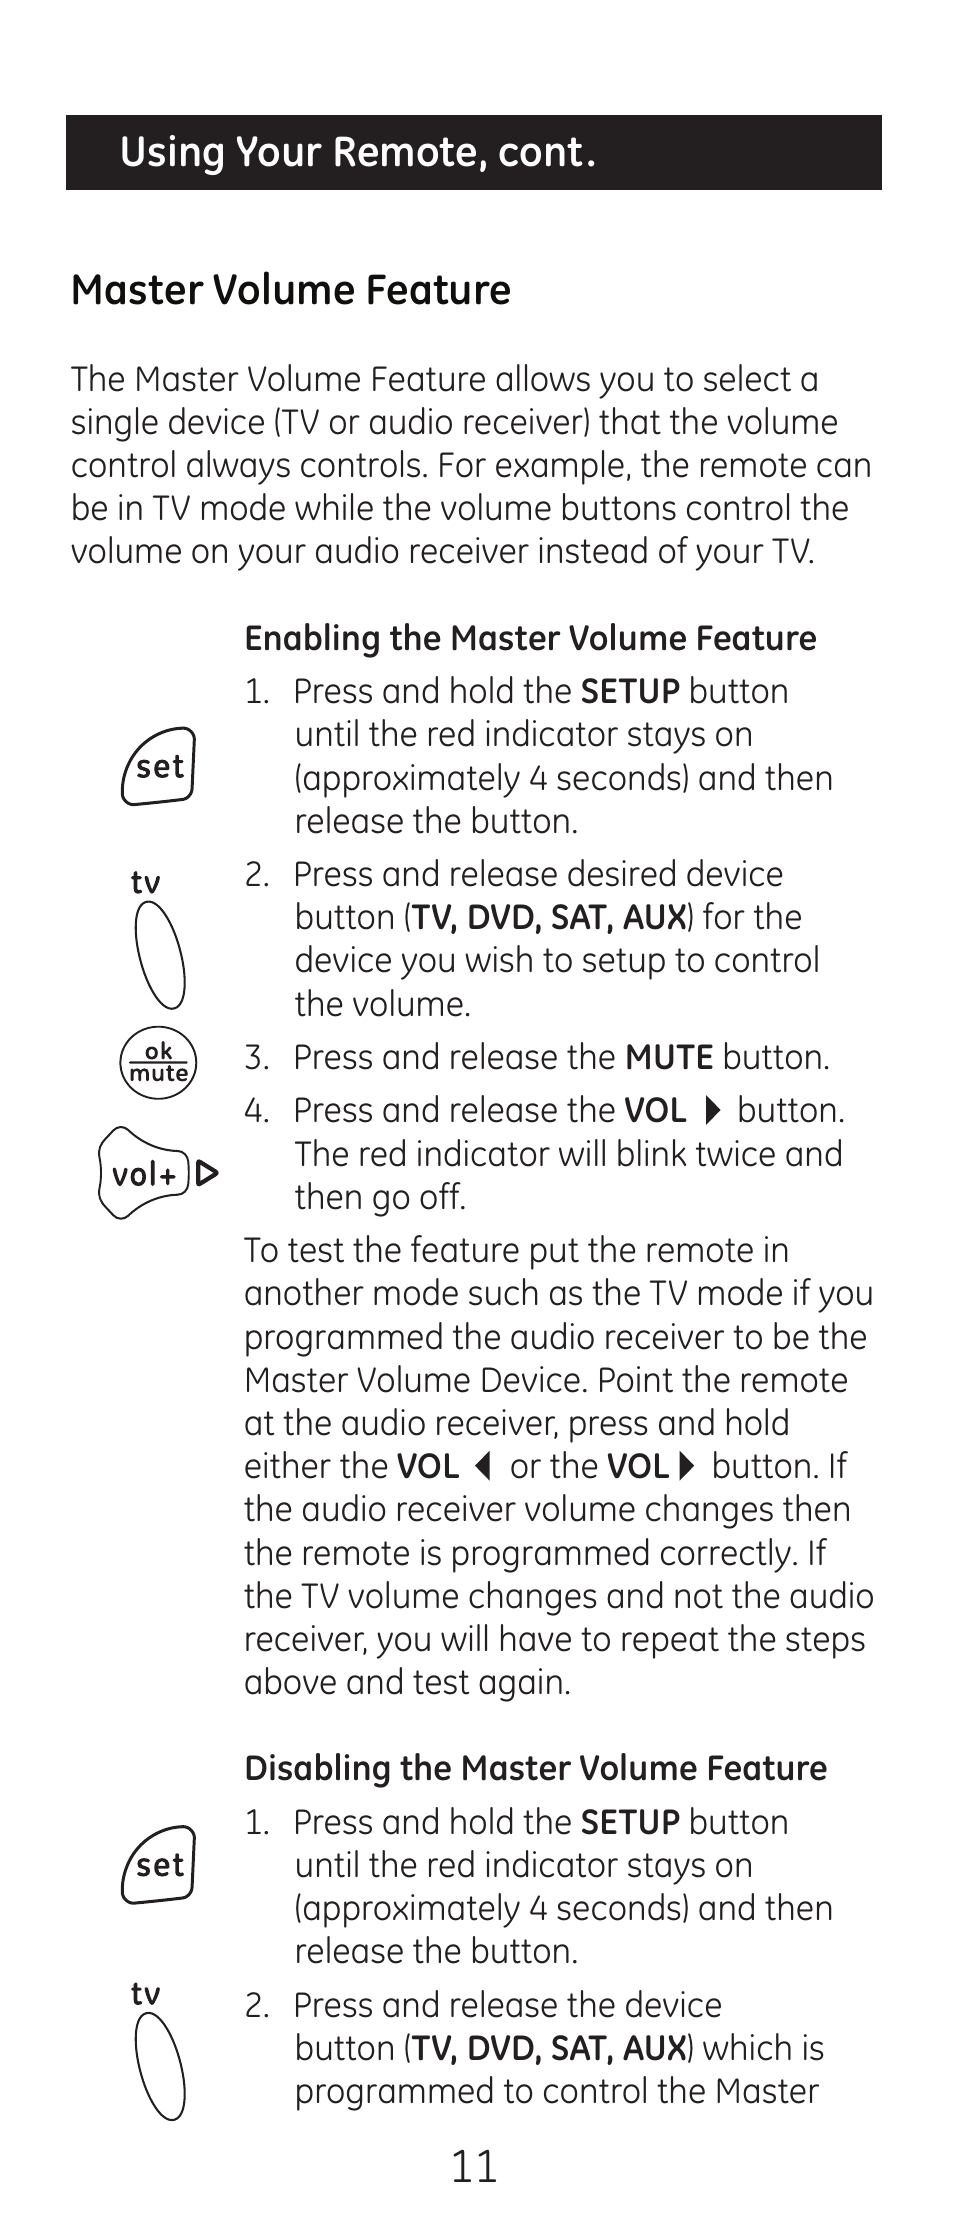 ge 24993 v2 ge universal remote control user manual page 11 44 rh manualsdir com GE Universal Remote Programming Guide GE Universal Remote Instruction Manual